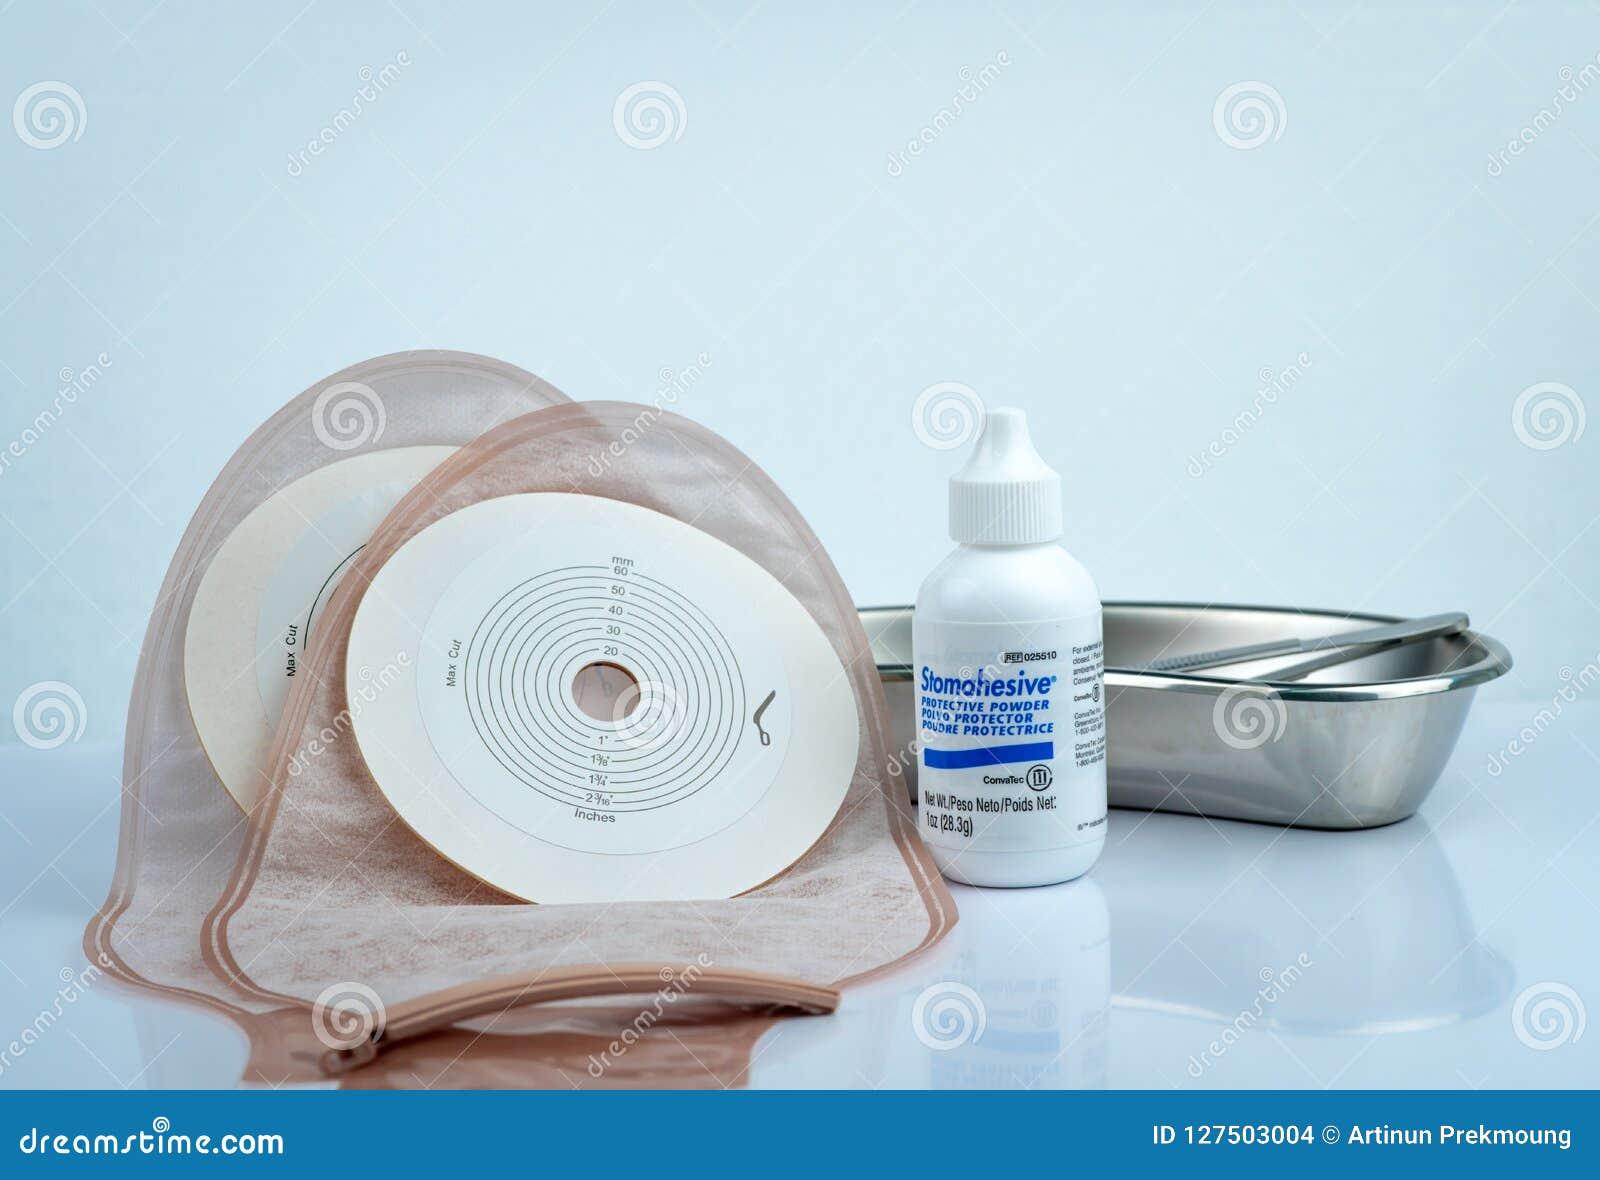 Stomahesive skyddande pulver Stomahesive produkt av Convatec Stomaomsorgprodukter och en drainable ileostomy eller colostomy för